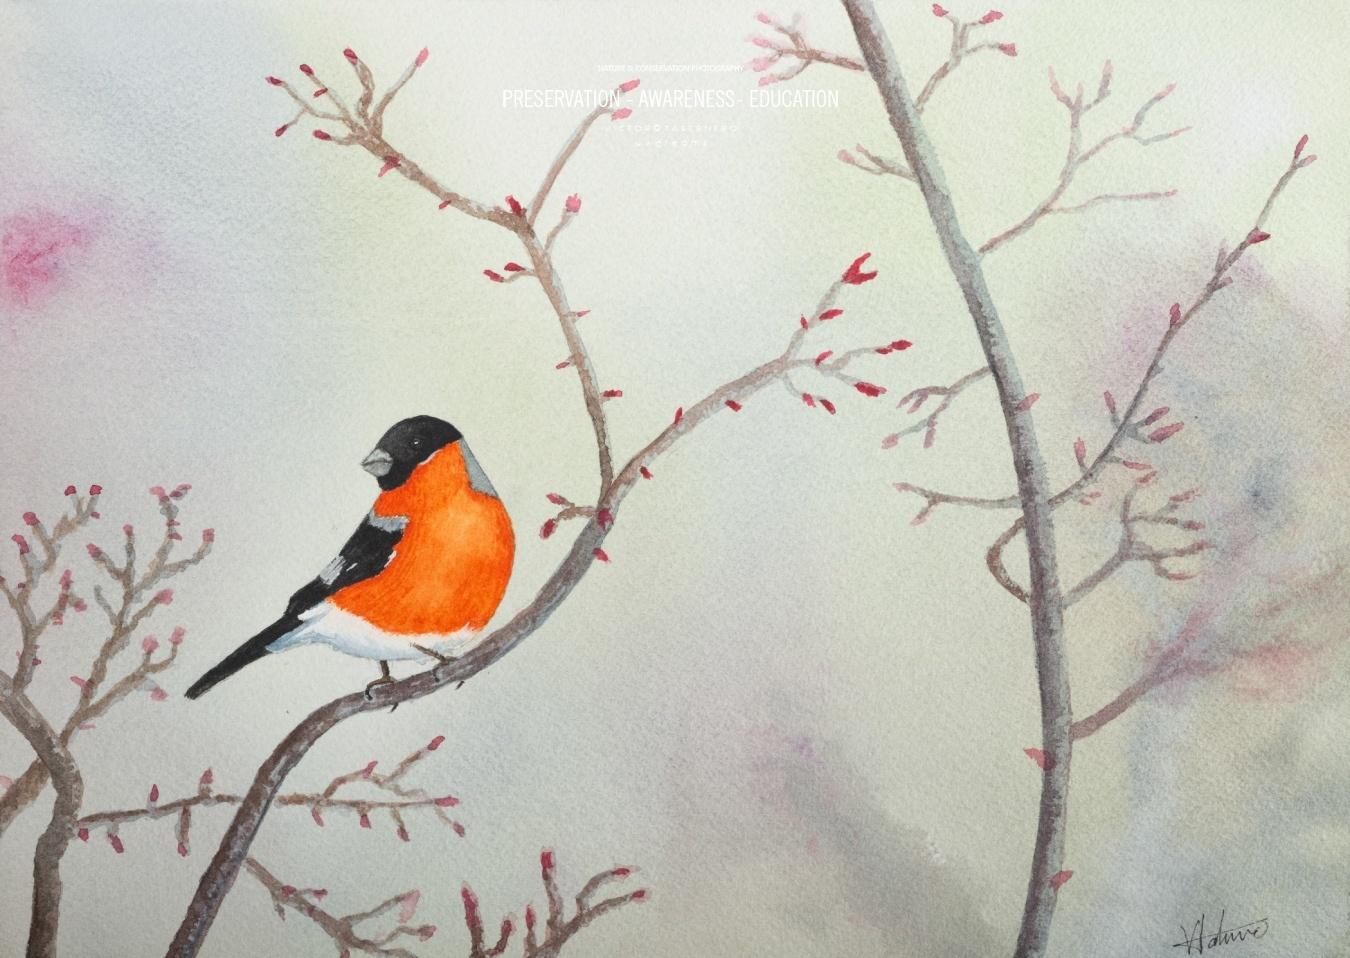 Spring 31x23cm - Vida Salvaje - Wildlife Conservation Photography, UWDREAMS.COM